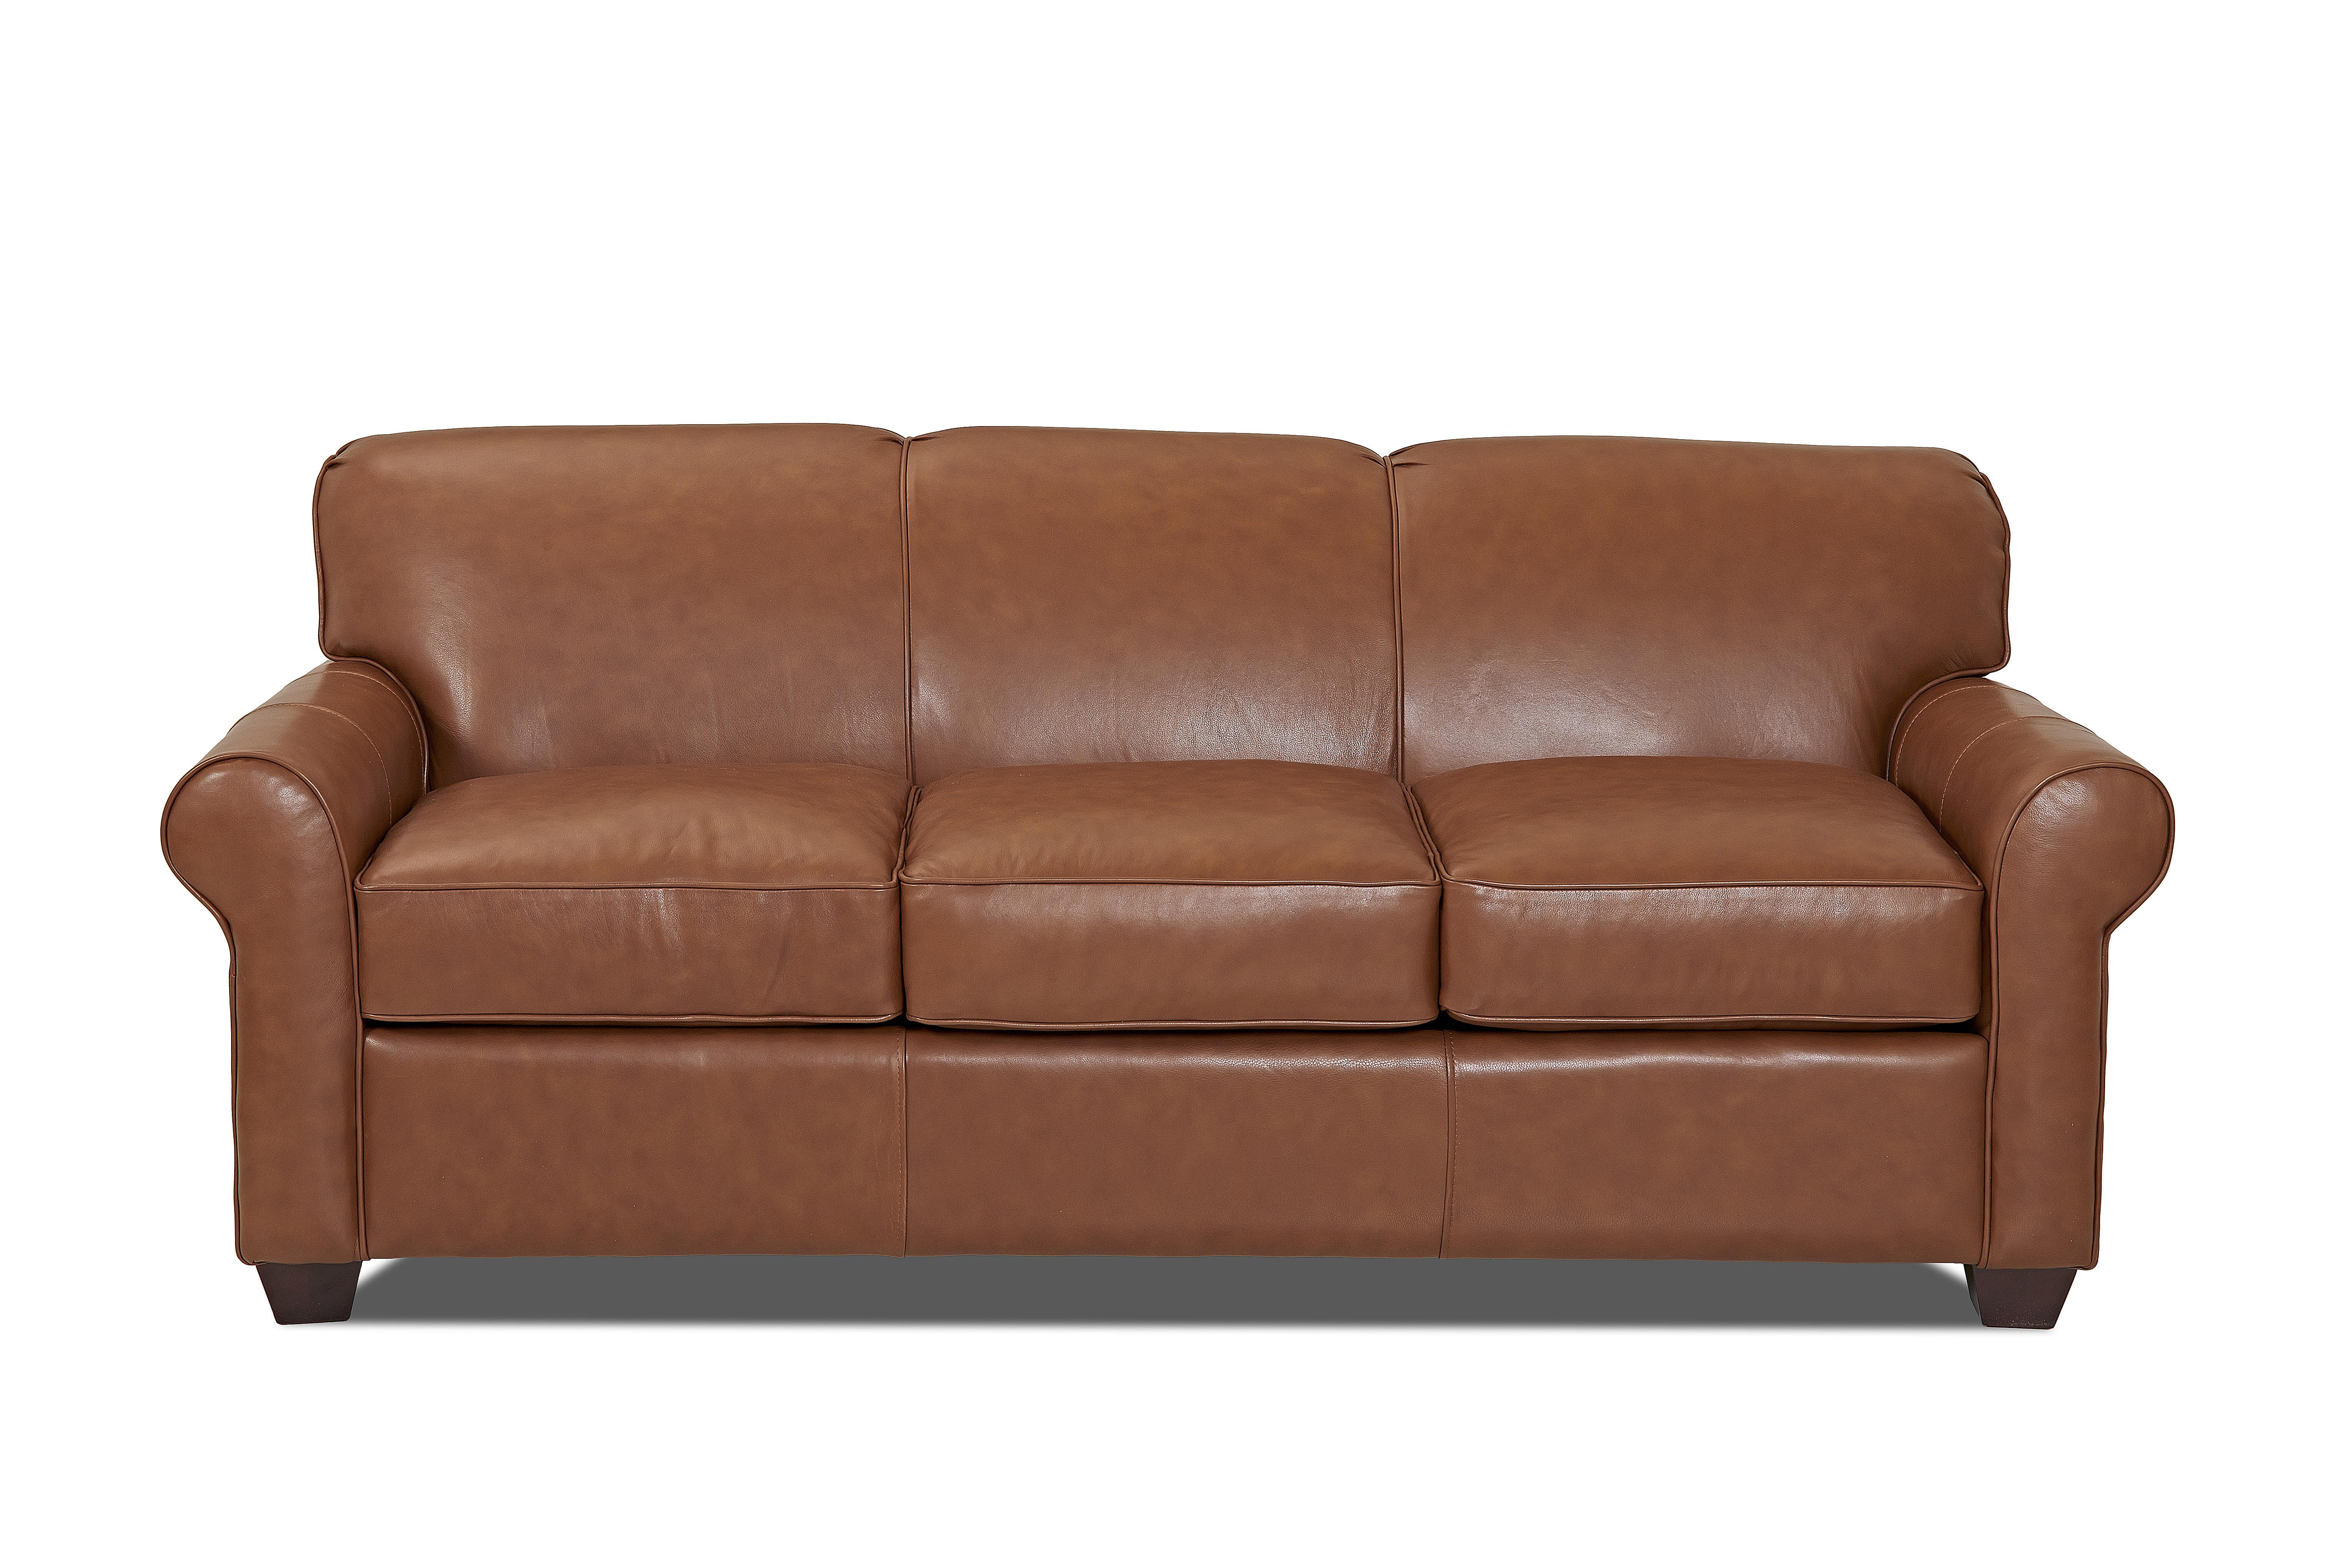 Wayfair Custom Upholstery Jennifer Leather Sofa Reviews Wayfair